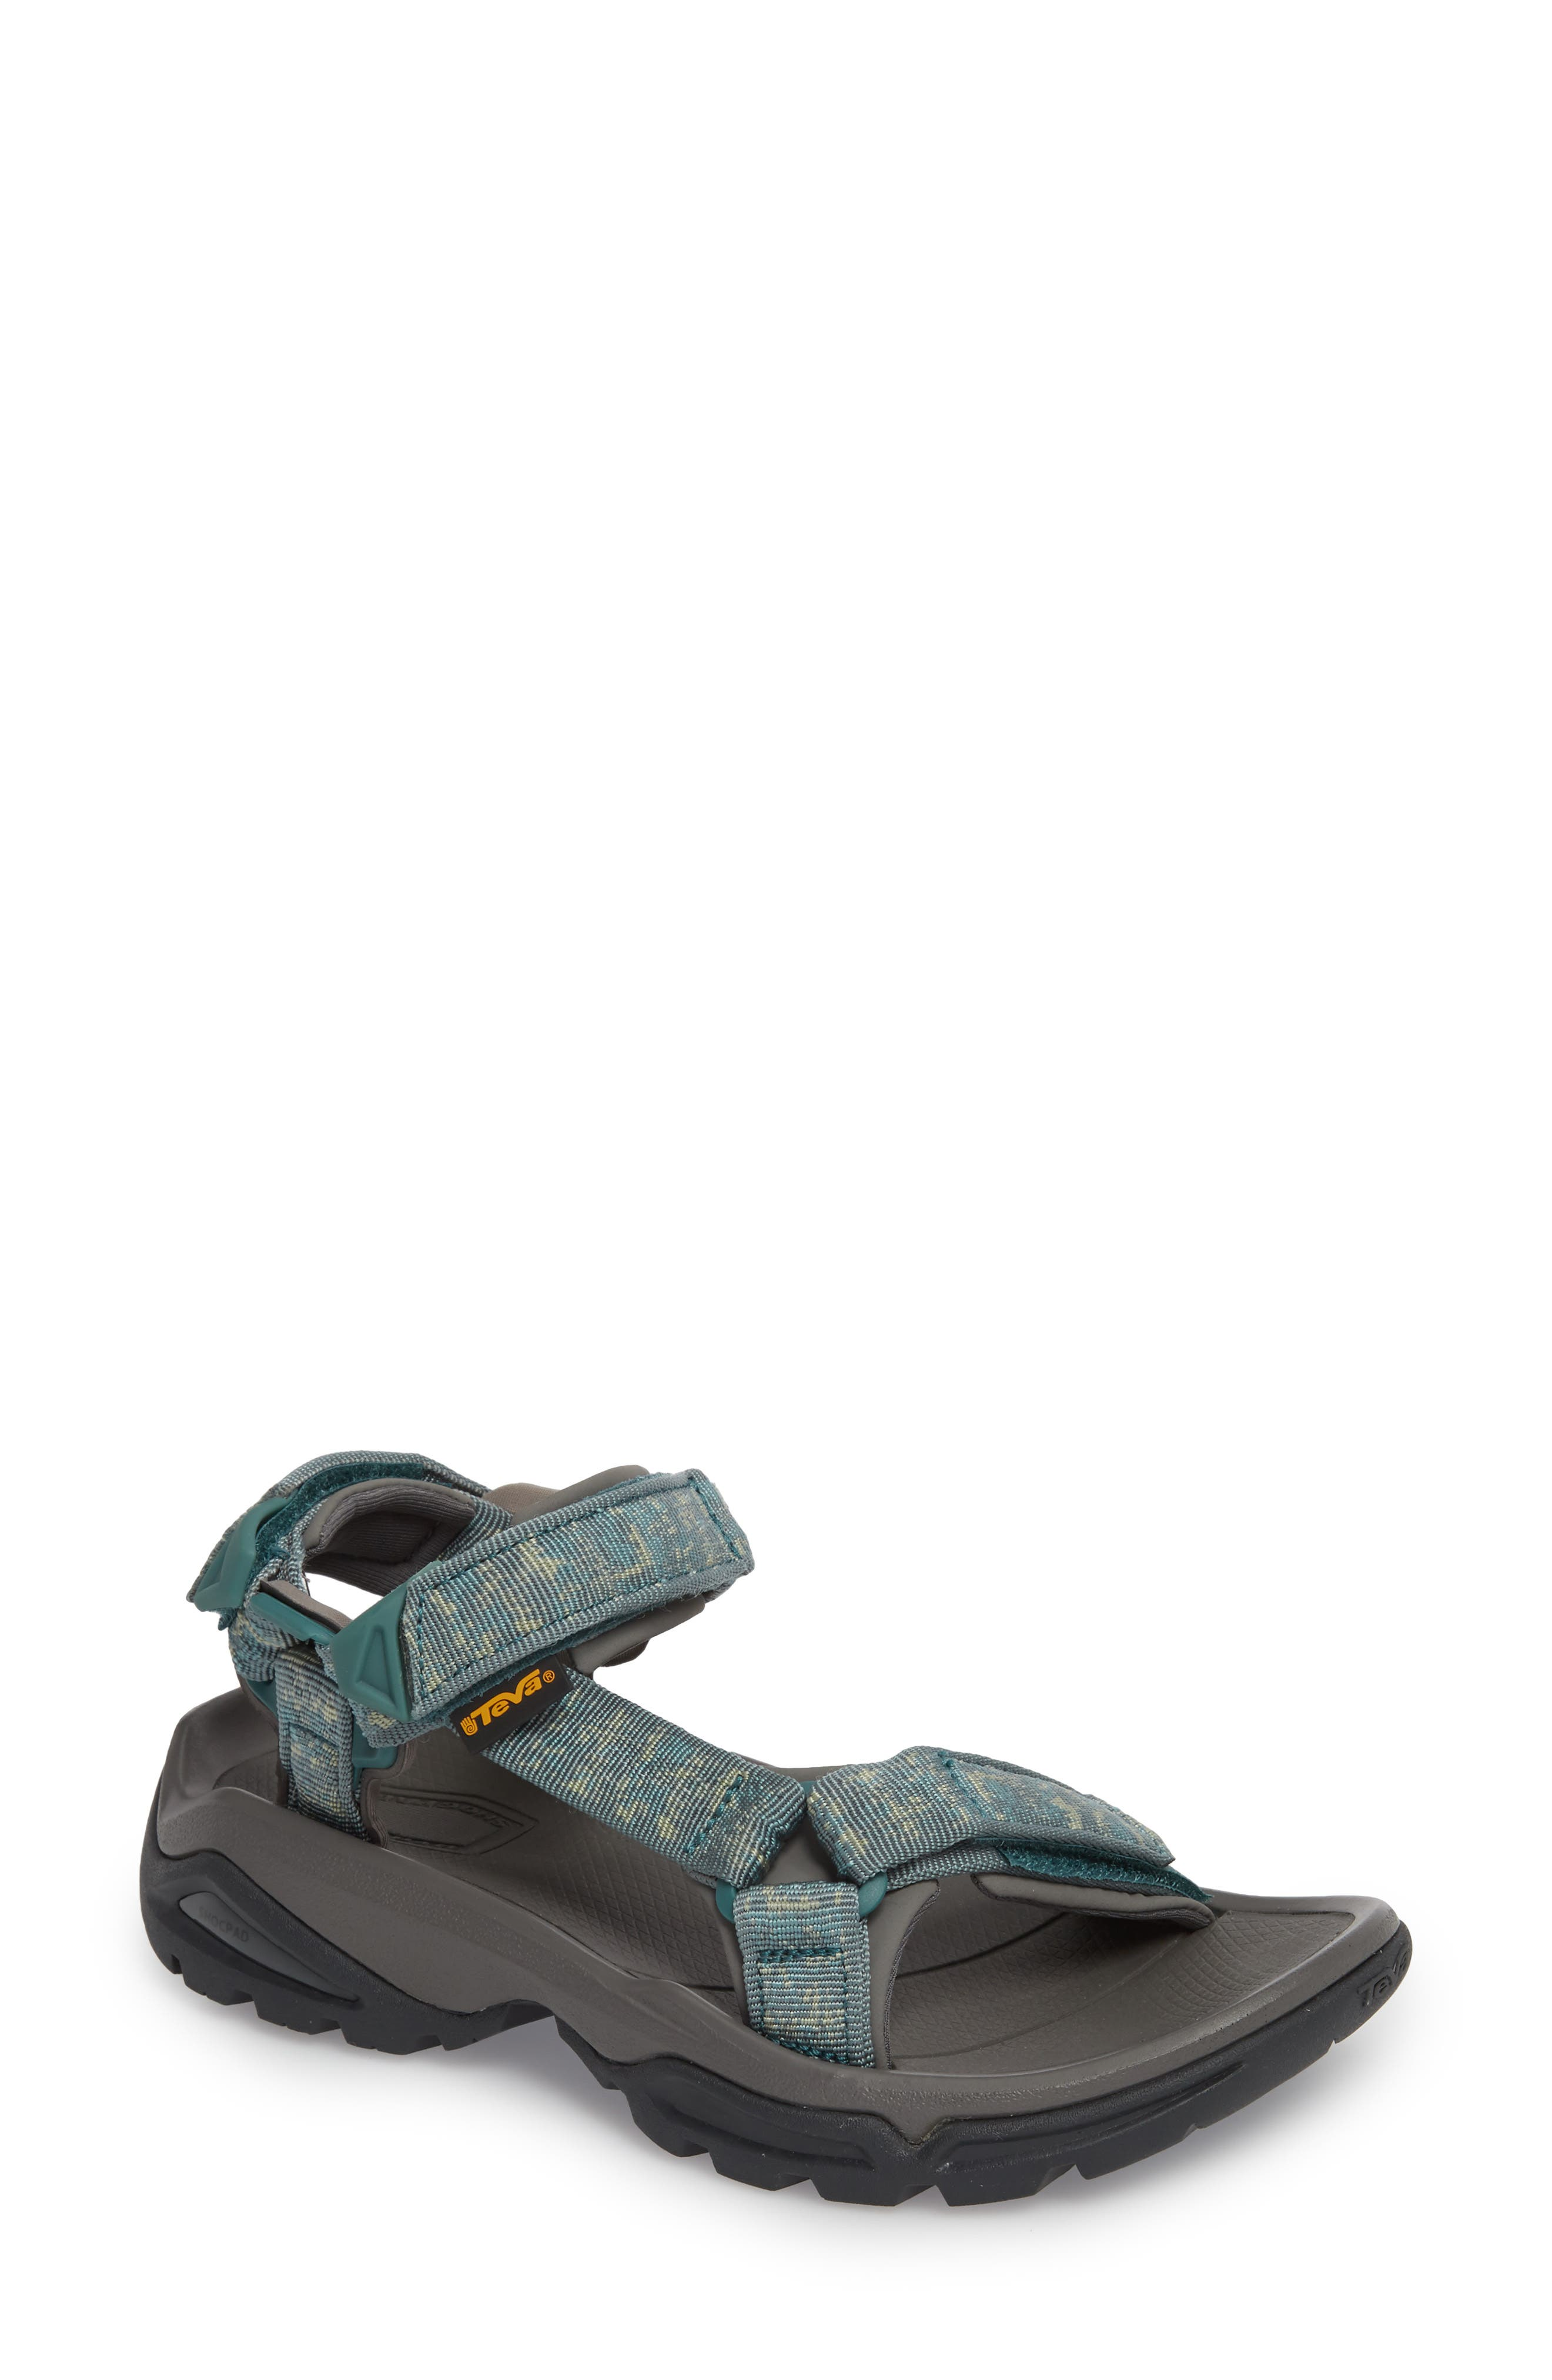 Terra FI 4 Sport Sandal,                         Main,                         color, ROCIO NORTH ATLANTIC